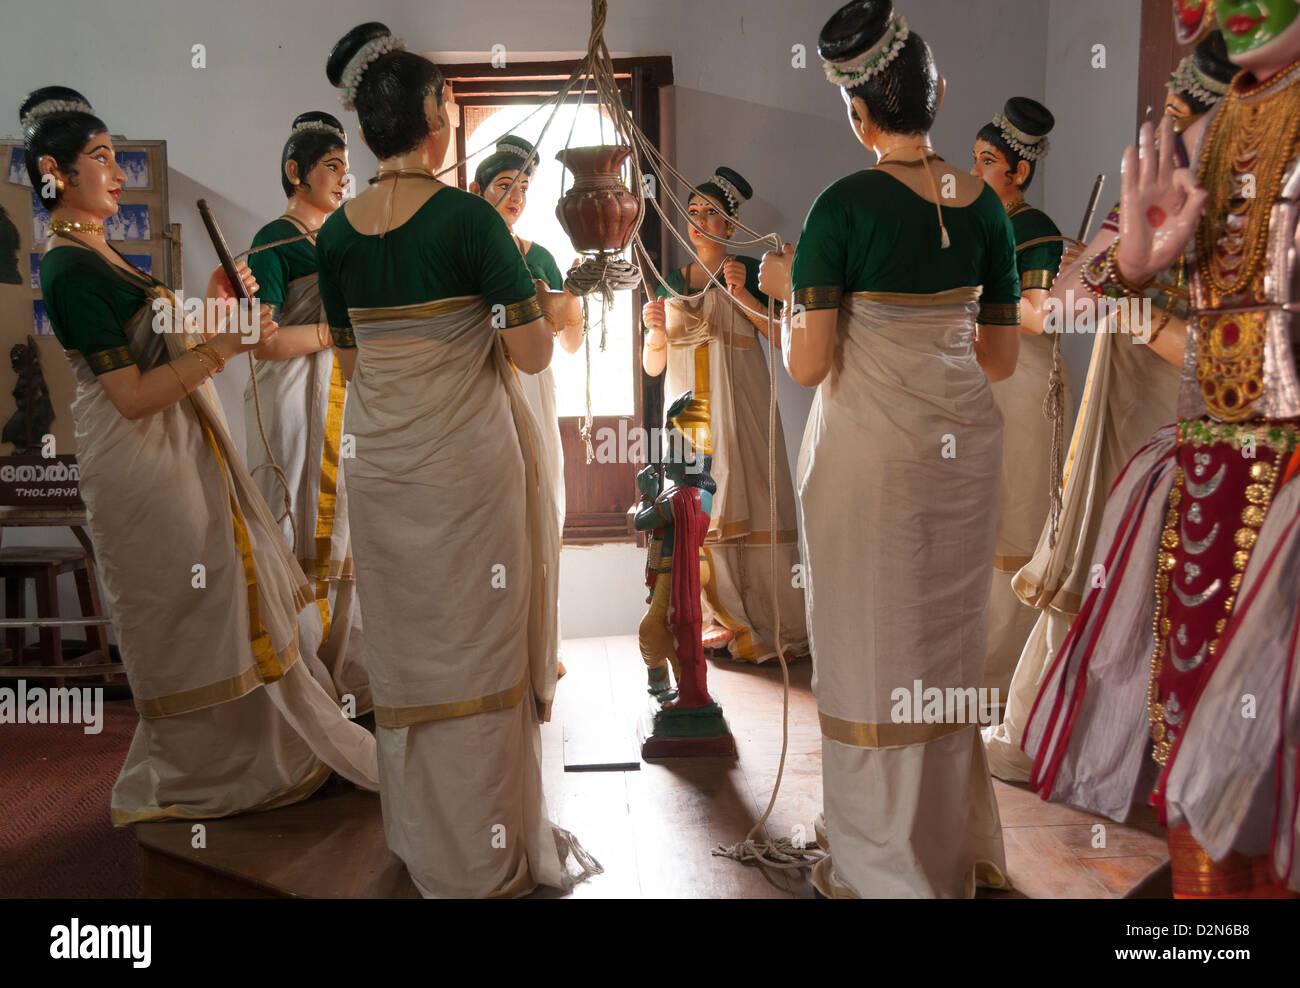 Uripinni kali  -  folk art performed in kerala - Stock Image